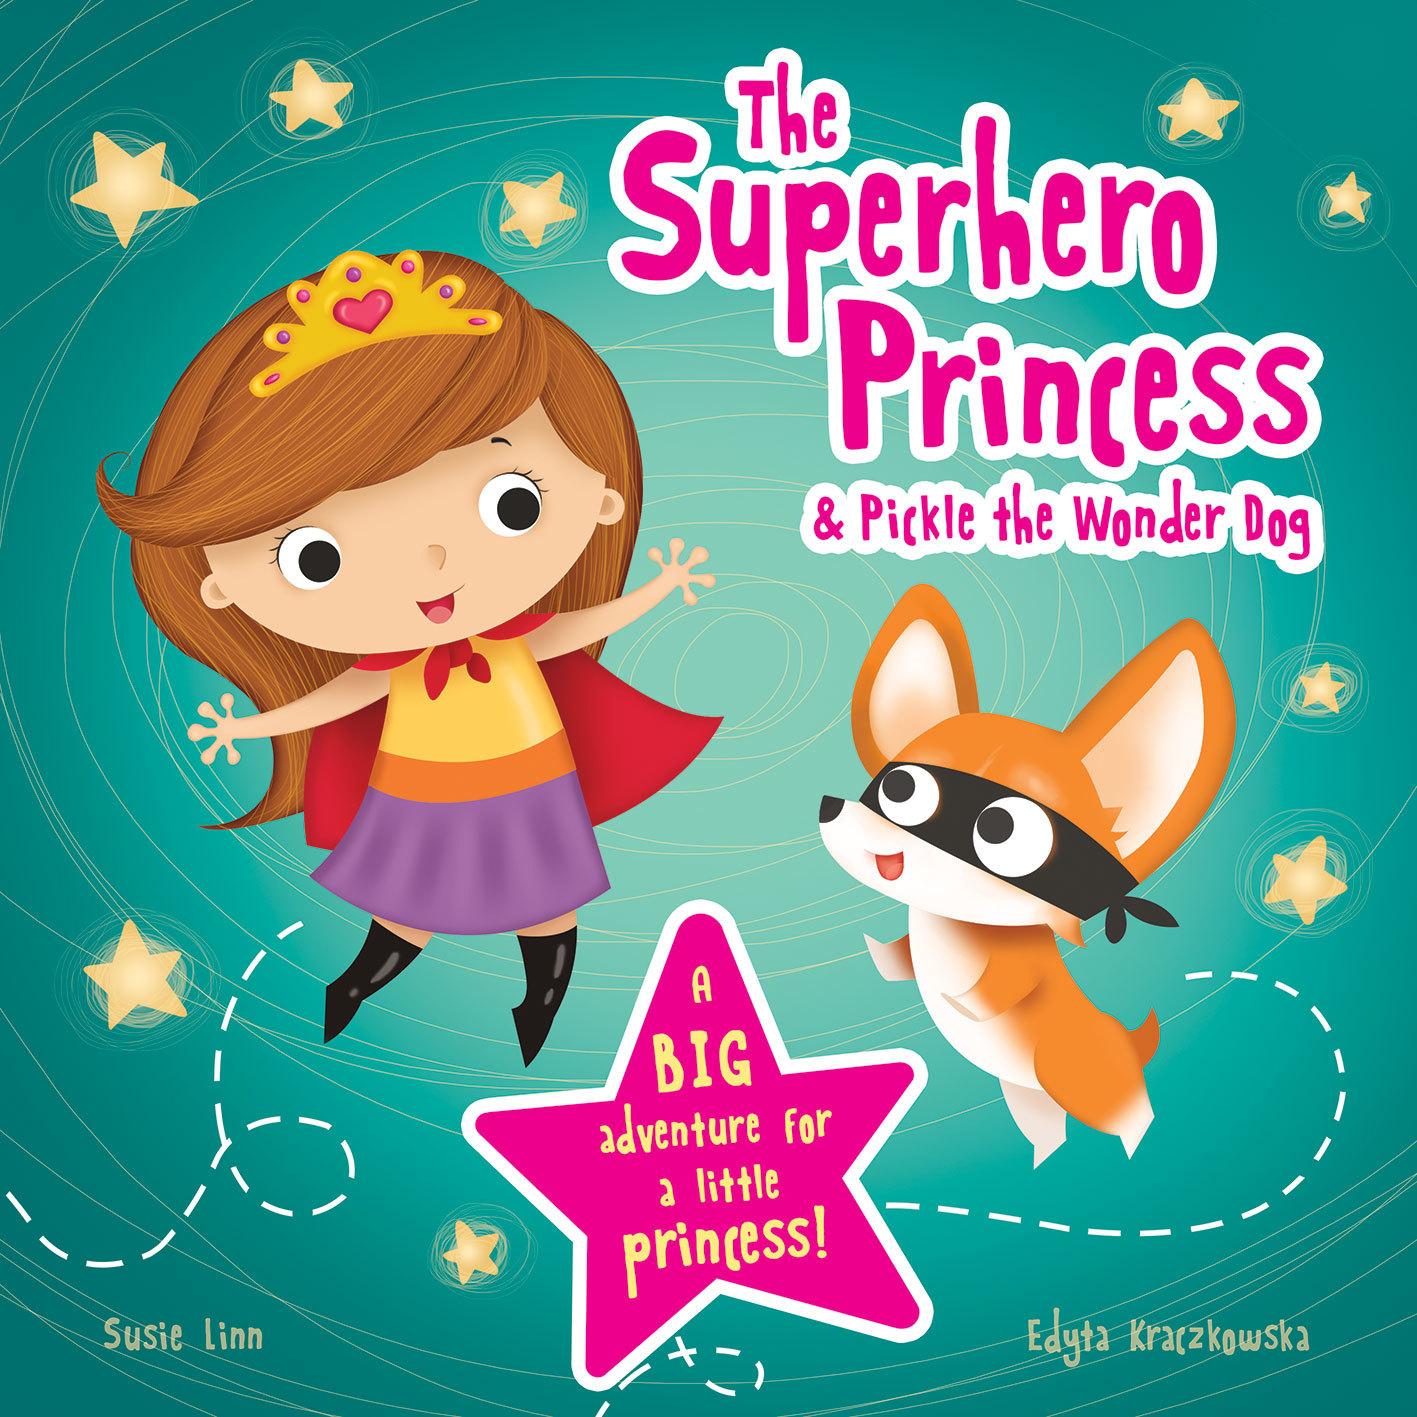 THE SUPERHERO PRINCESS & PICKLE THE WONDER DOG